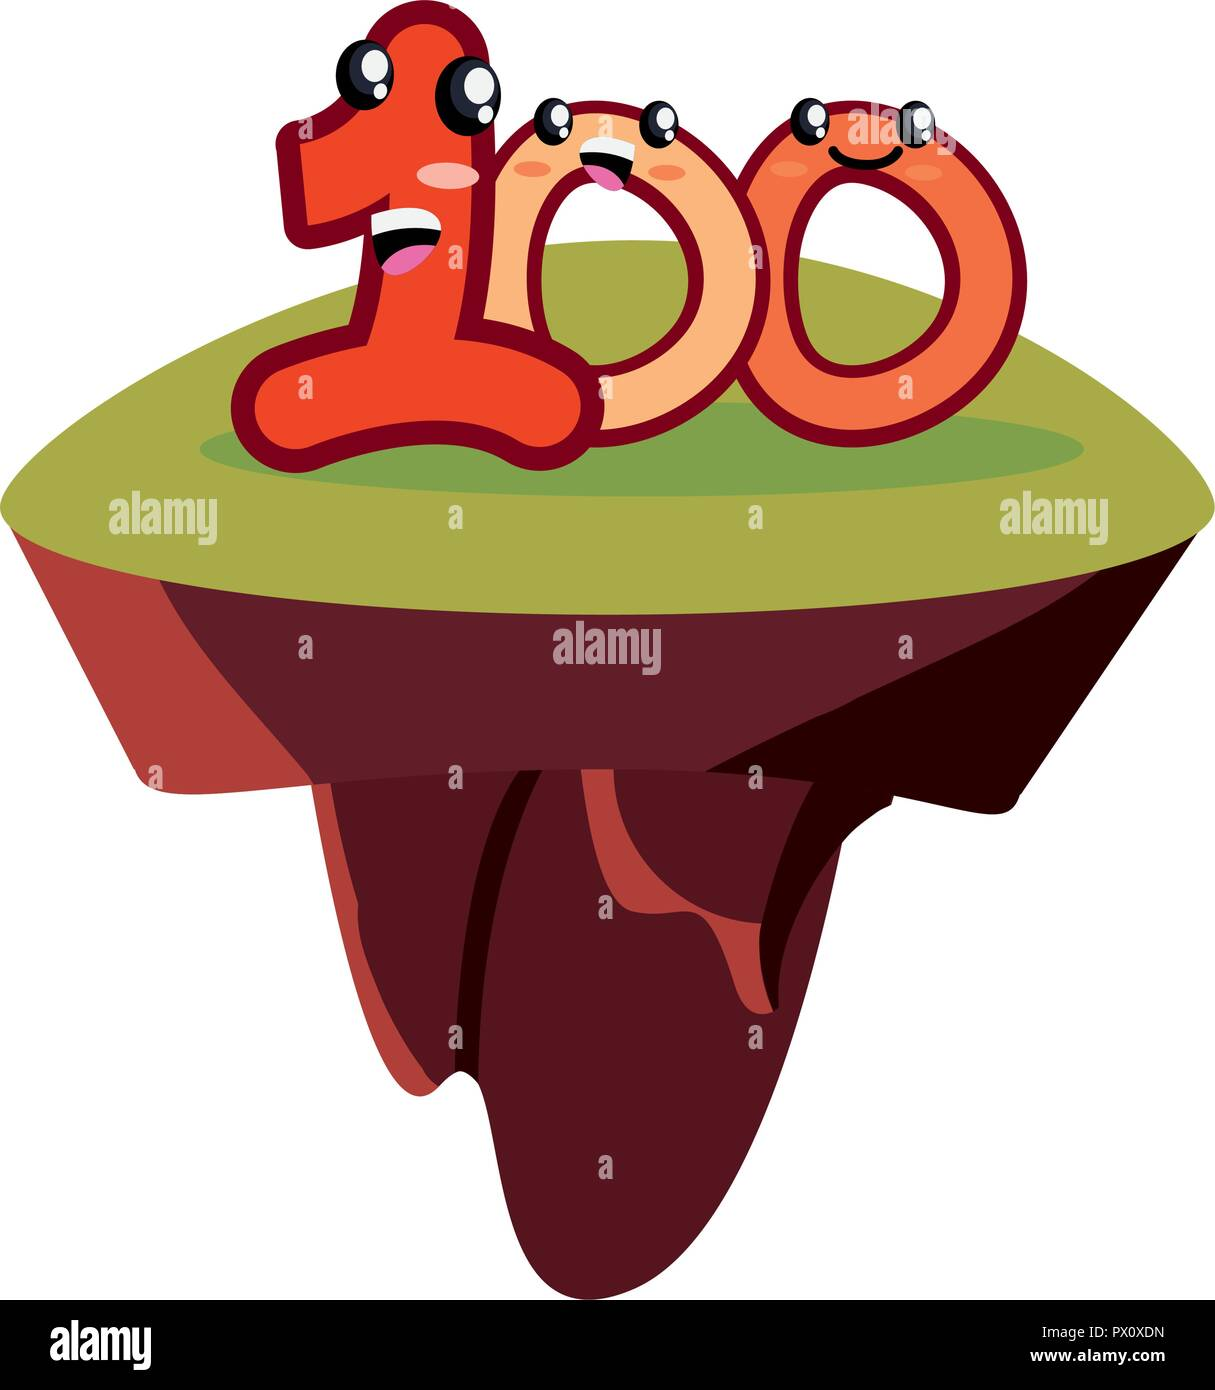 kawaii number one hundred character cartoon vector illustration - Stock Vector